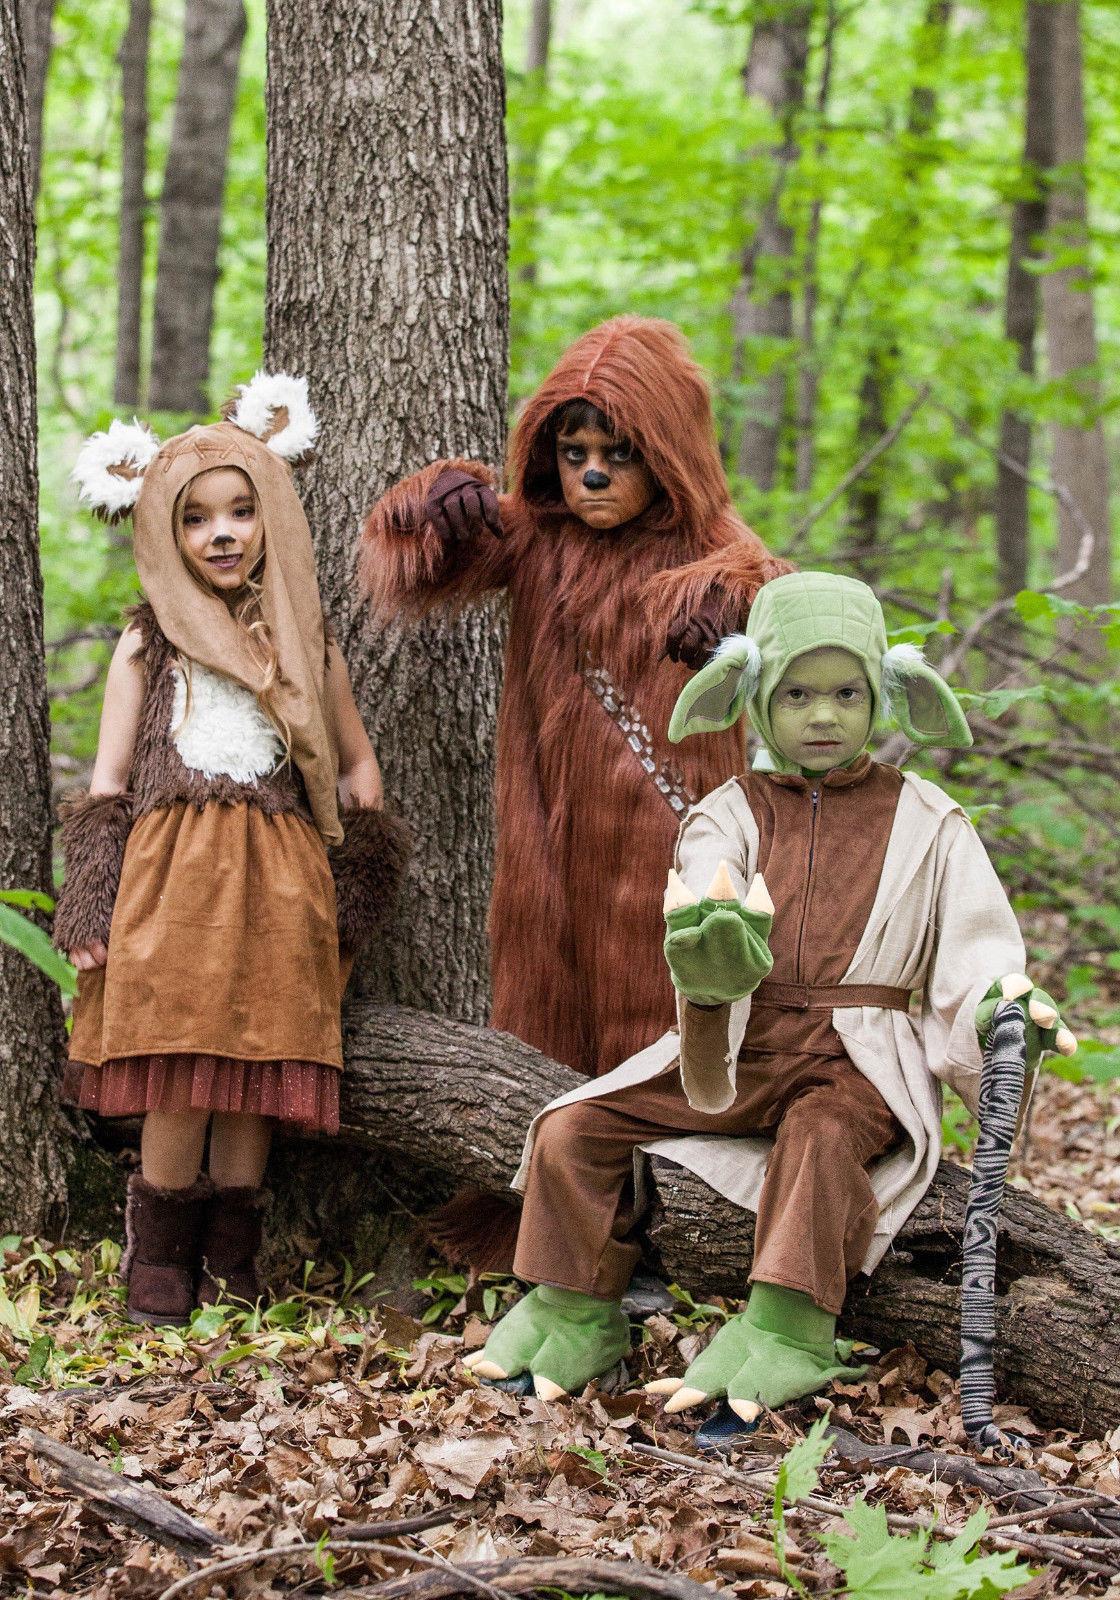 Chewbacca Wookie Chewie PREMIUM Deluxe Star Wars Child Costume 4T 3